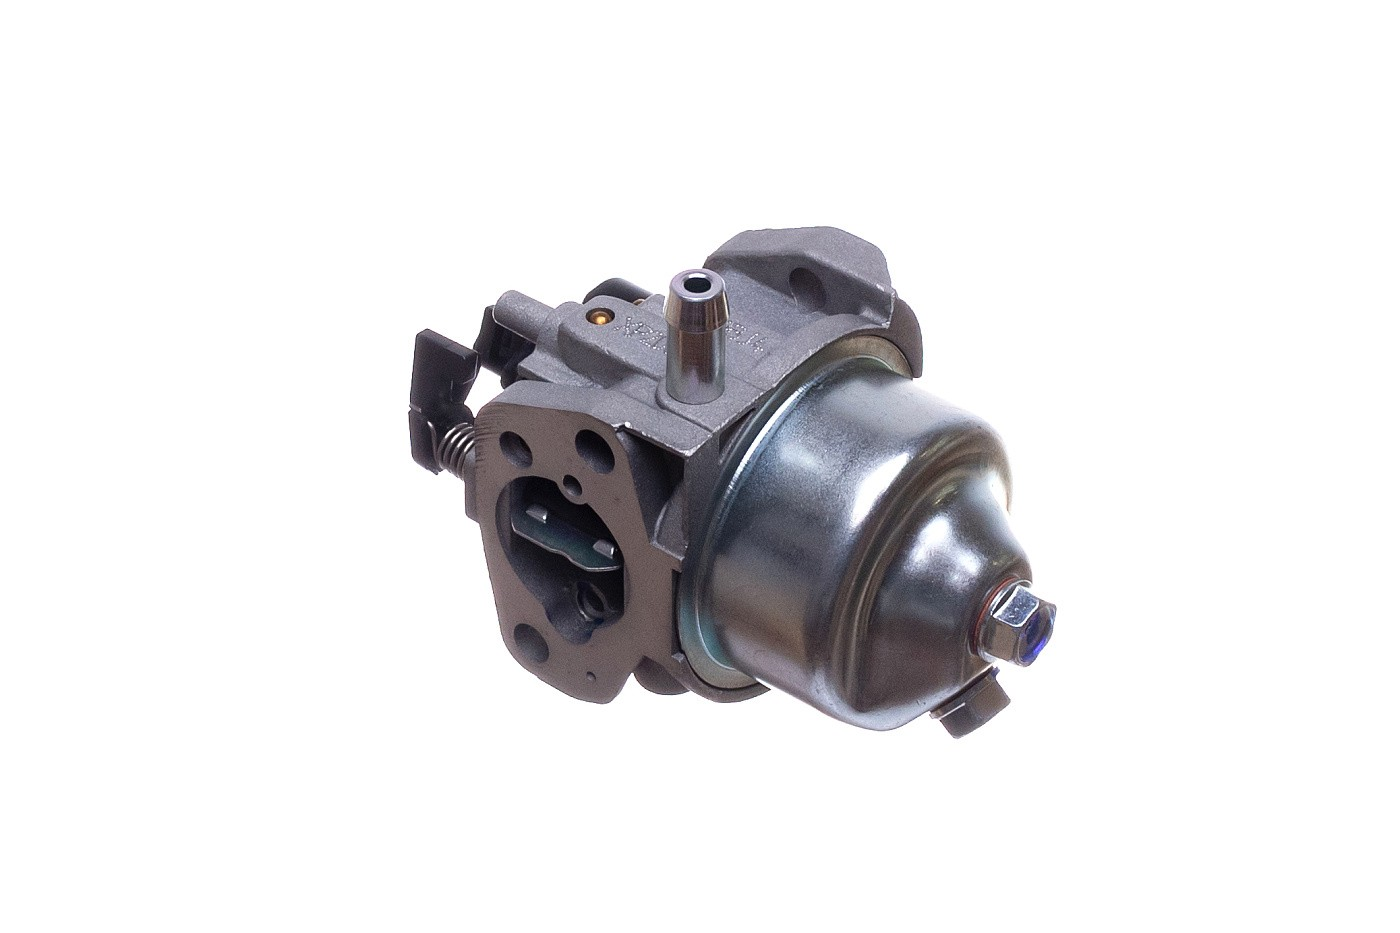 Karburátor Zongshen XP200 6,5HP - 100005371